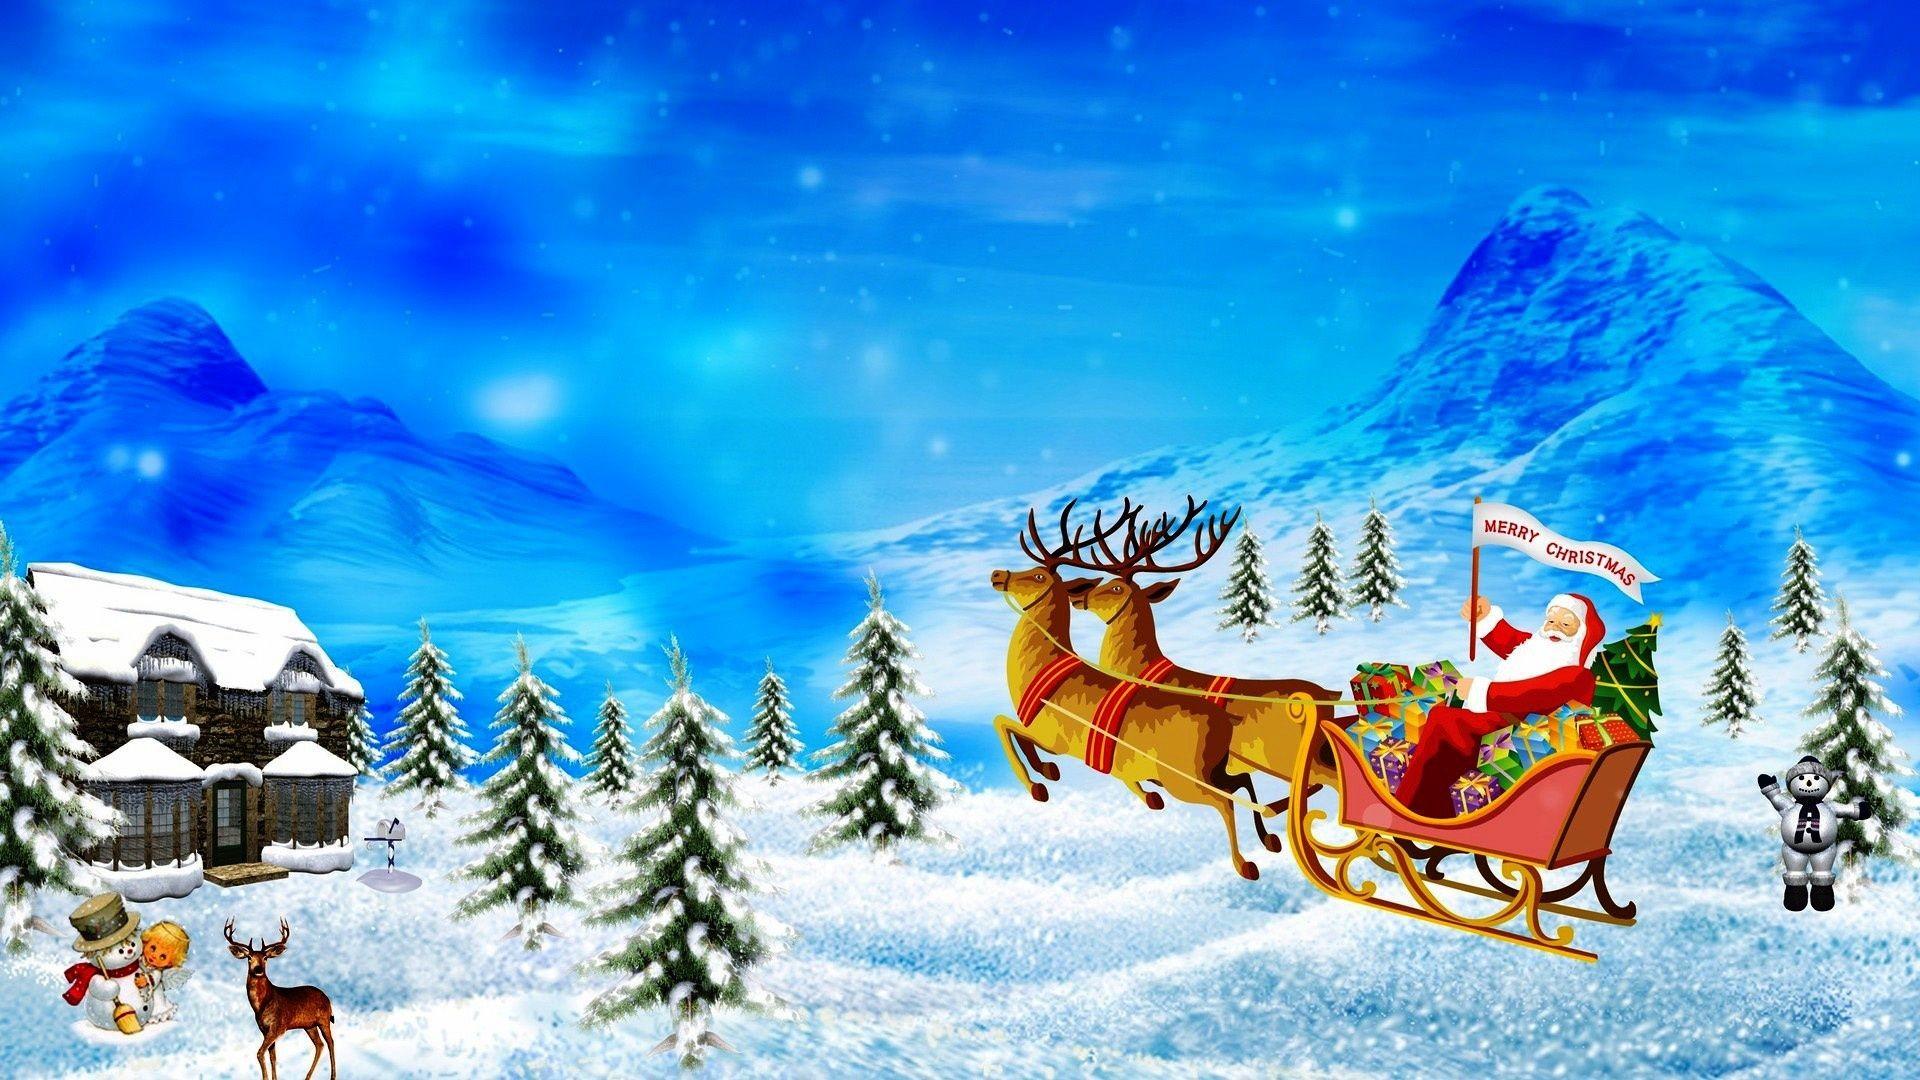 Res: 1920x1080, christmas wallpaper 03 merry christmas wallpaper 04 merry christmas